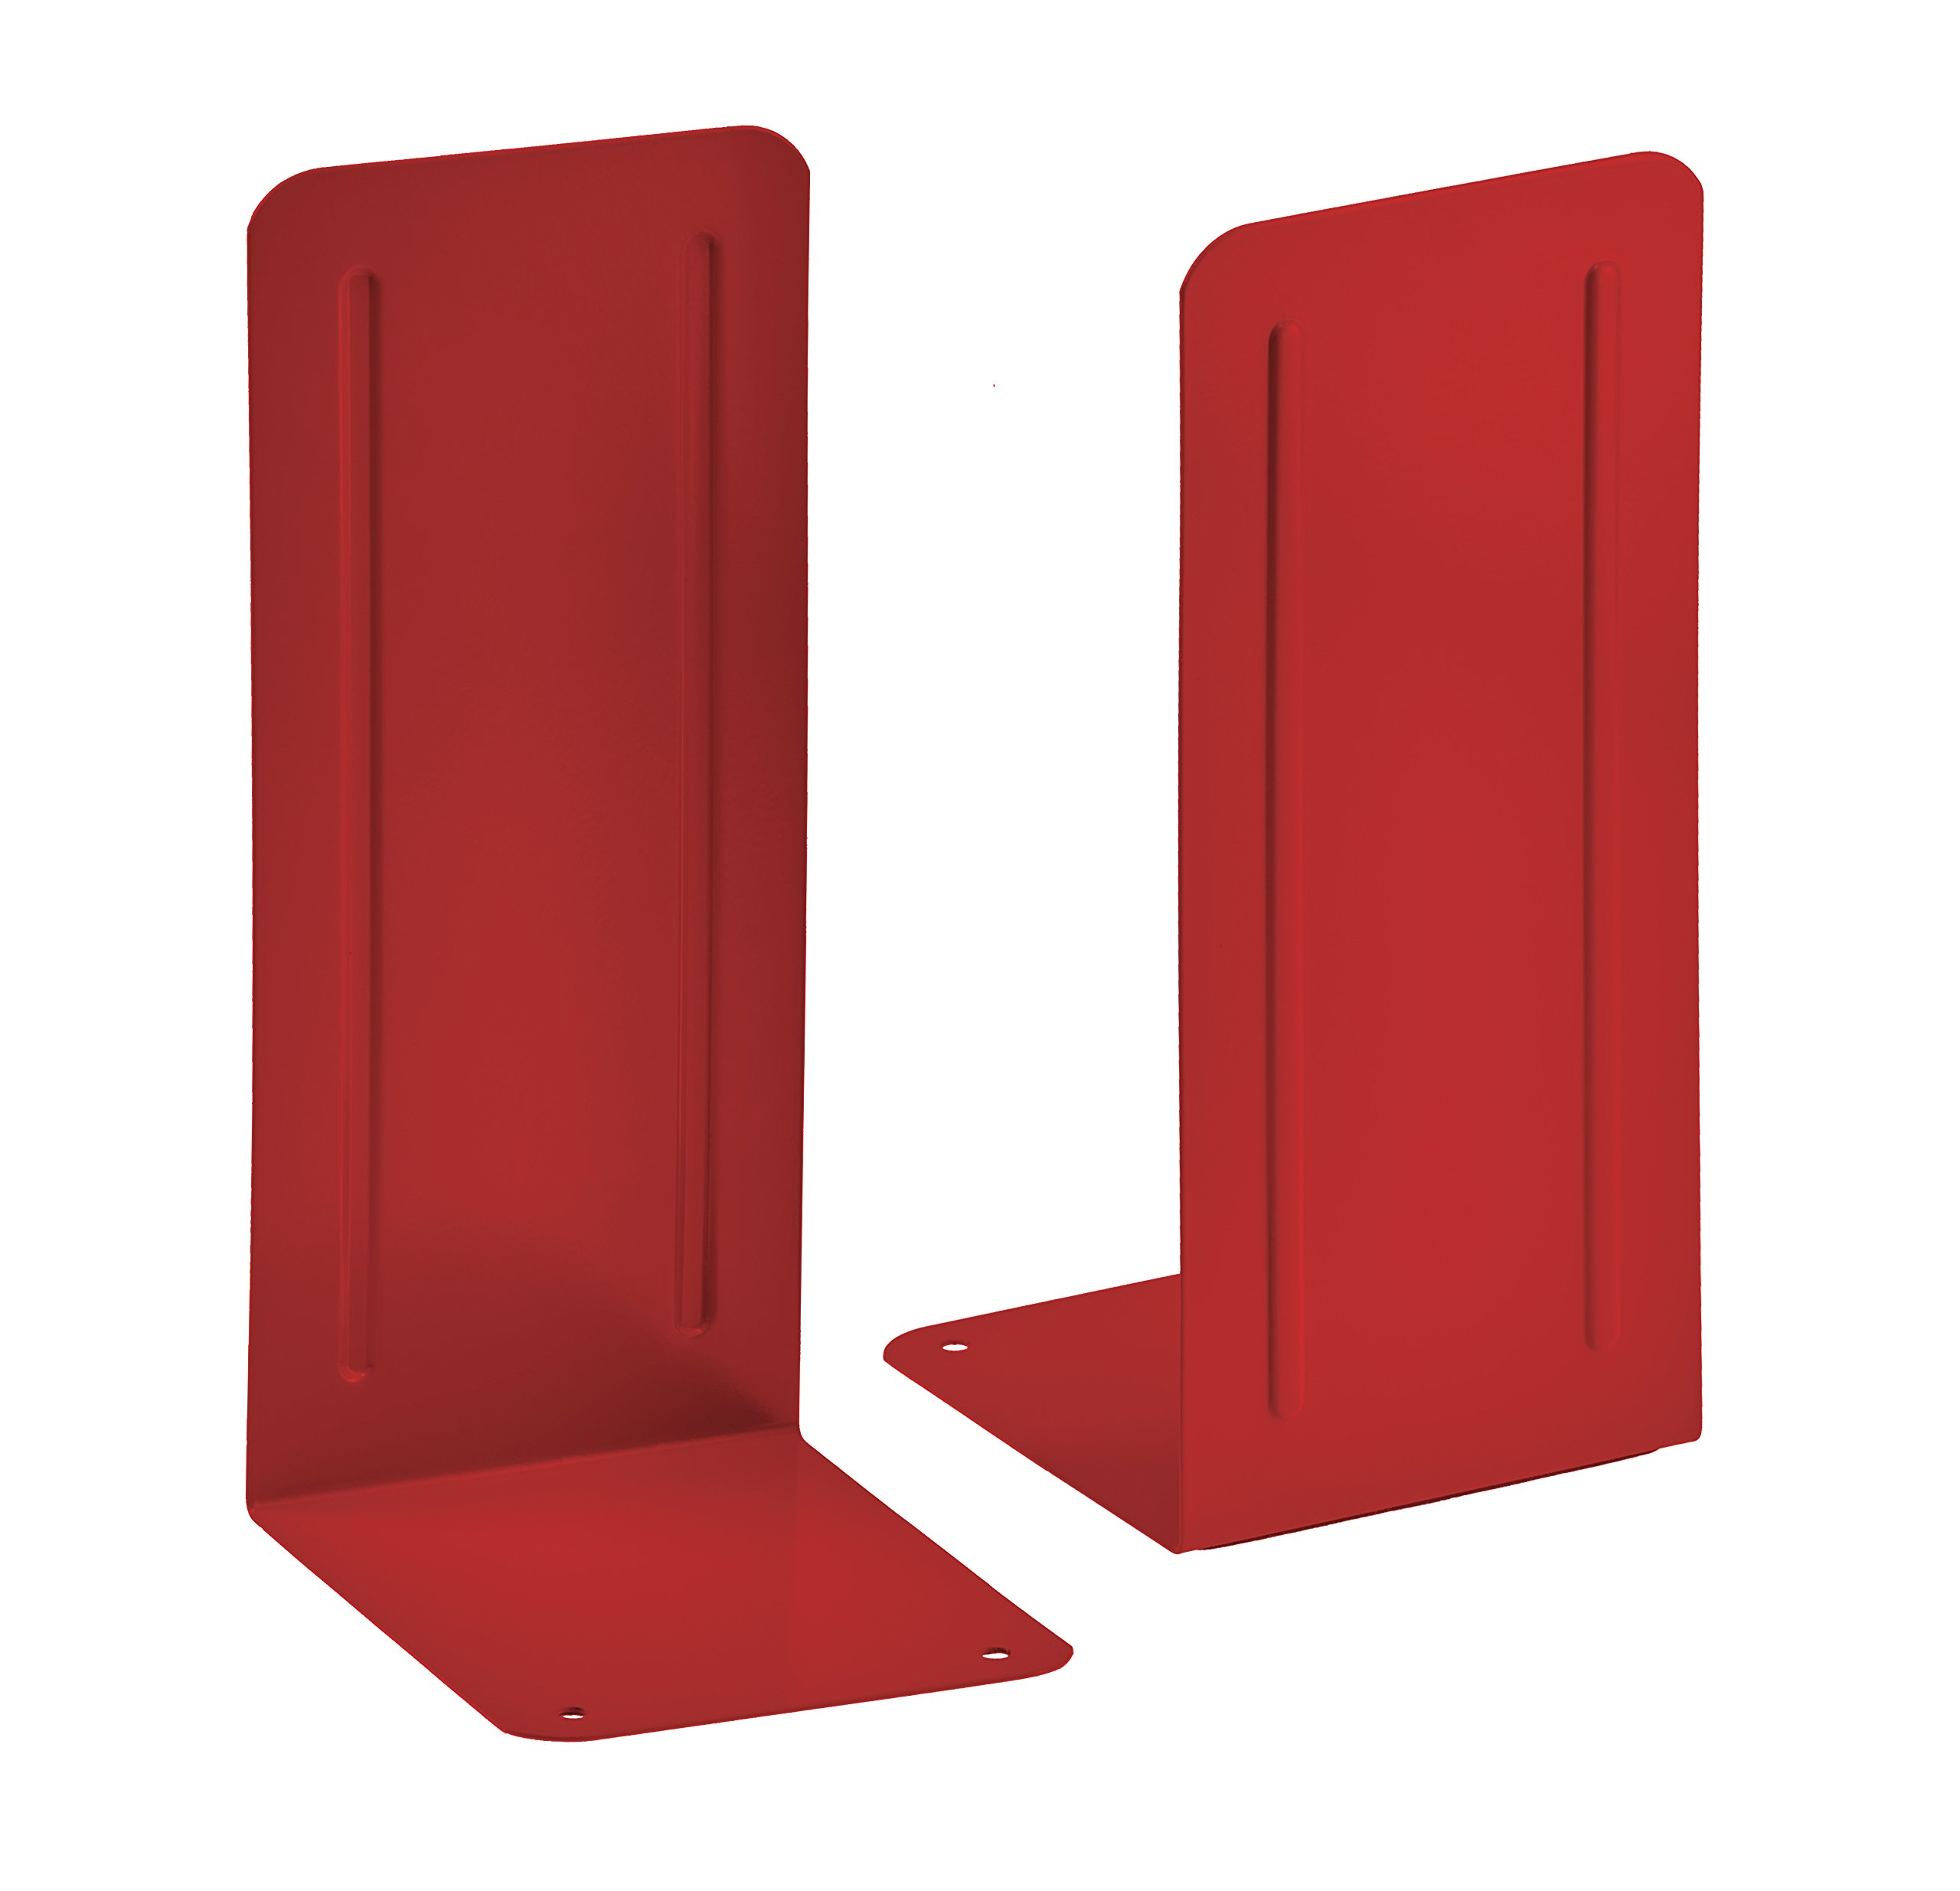 Acrimet Jumbo Premium Bookends 9'' (Red Color) (1 Pair)